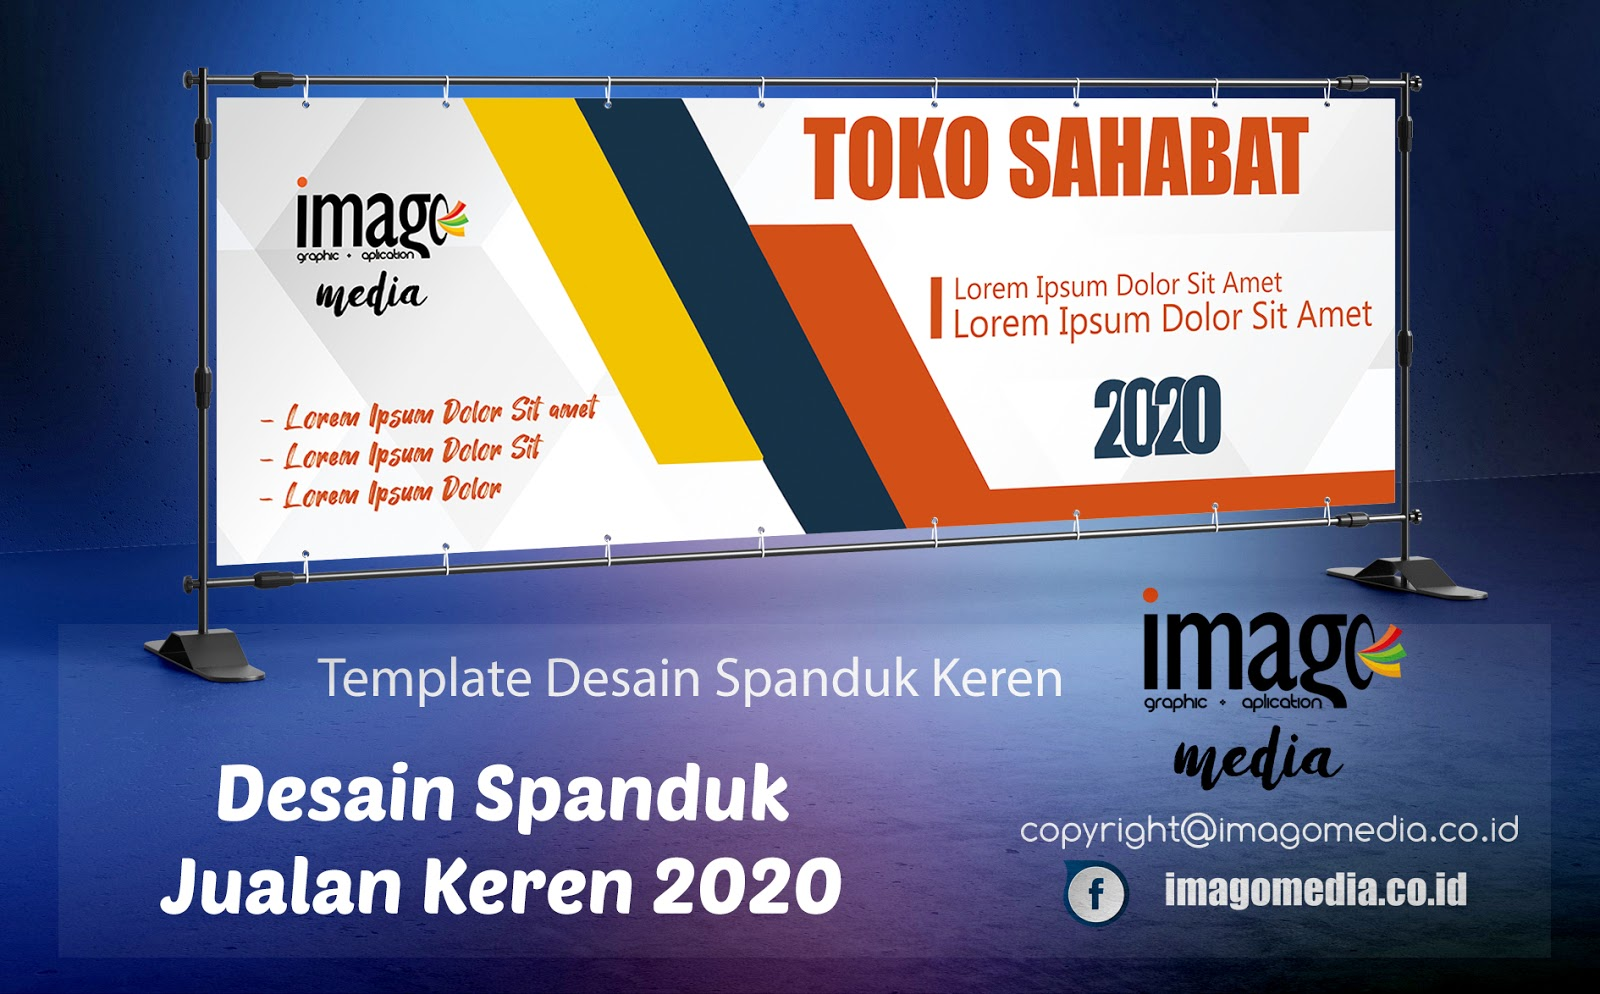 Download Desain Spanduk Jualan Keren 2020 - Imago Media ...